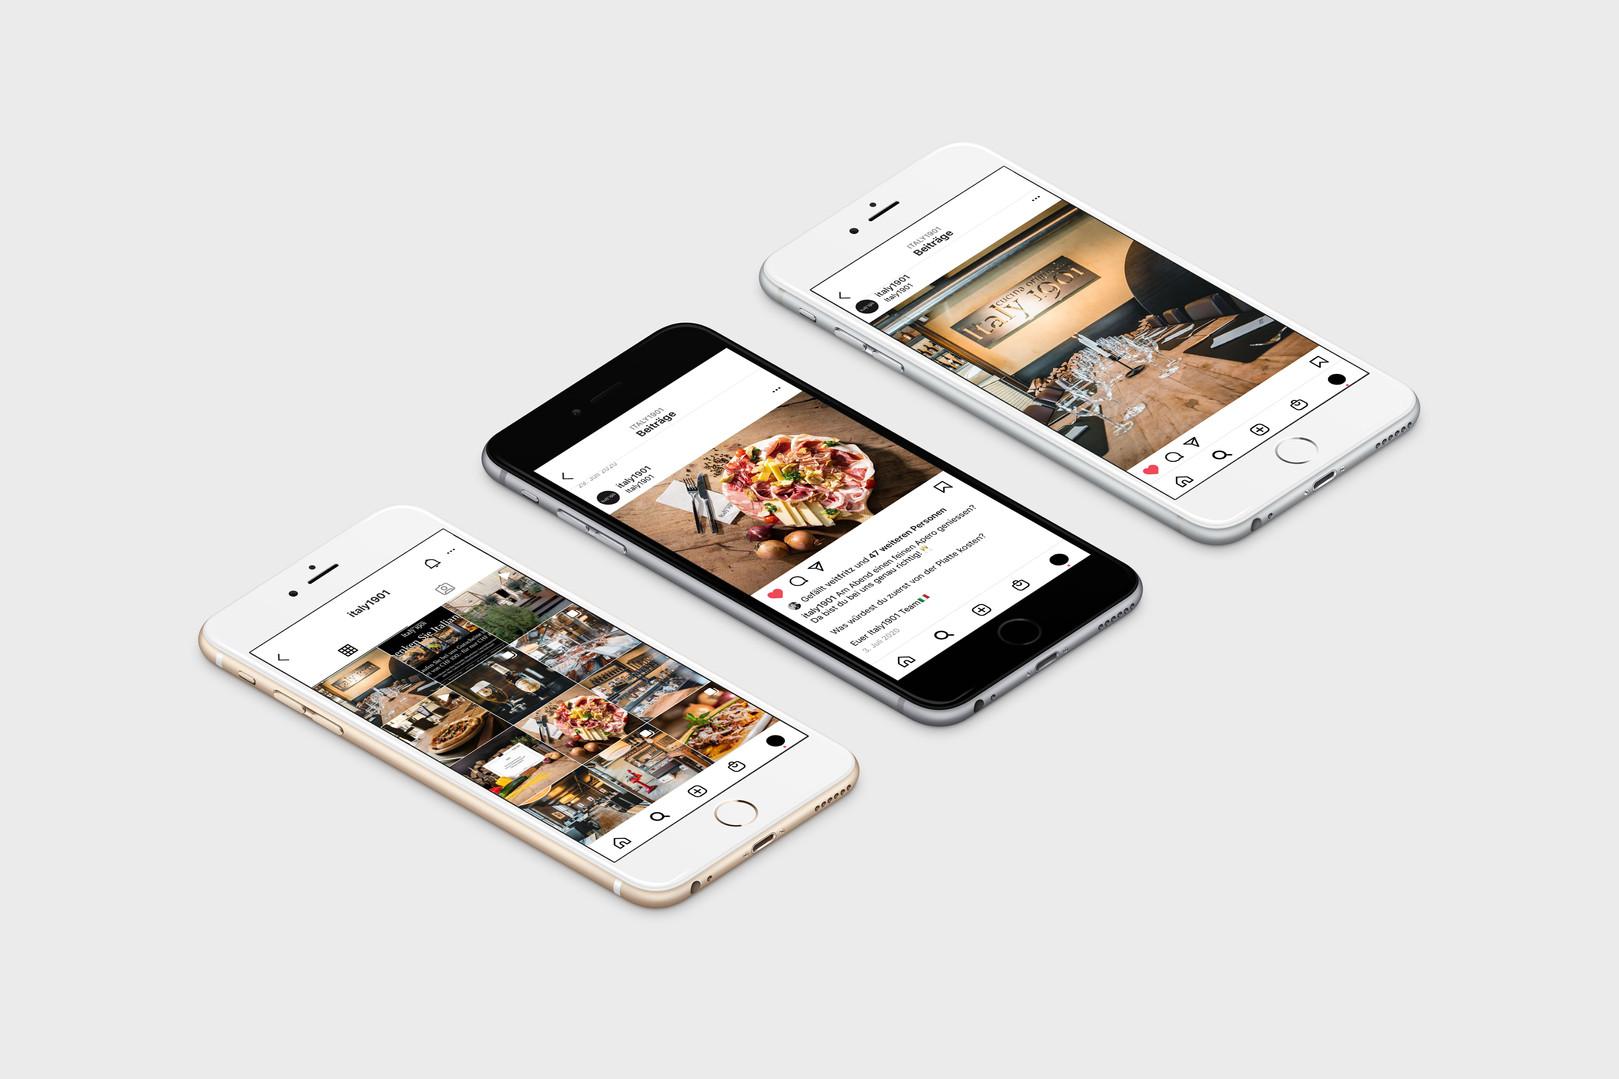 iPhone-6-Plus-Isometric-view-Mockup.jpg